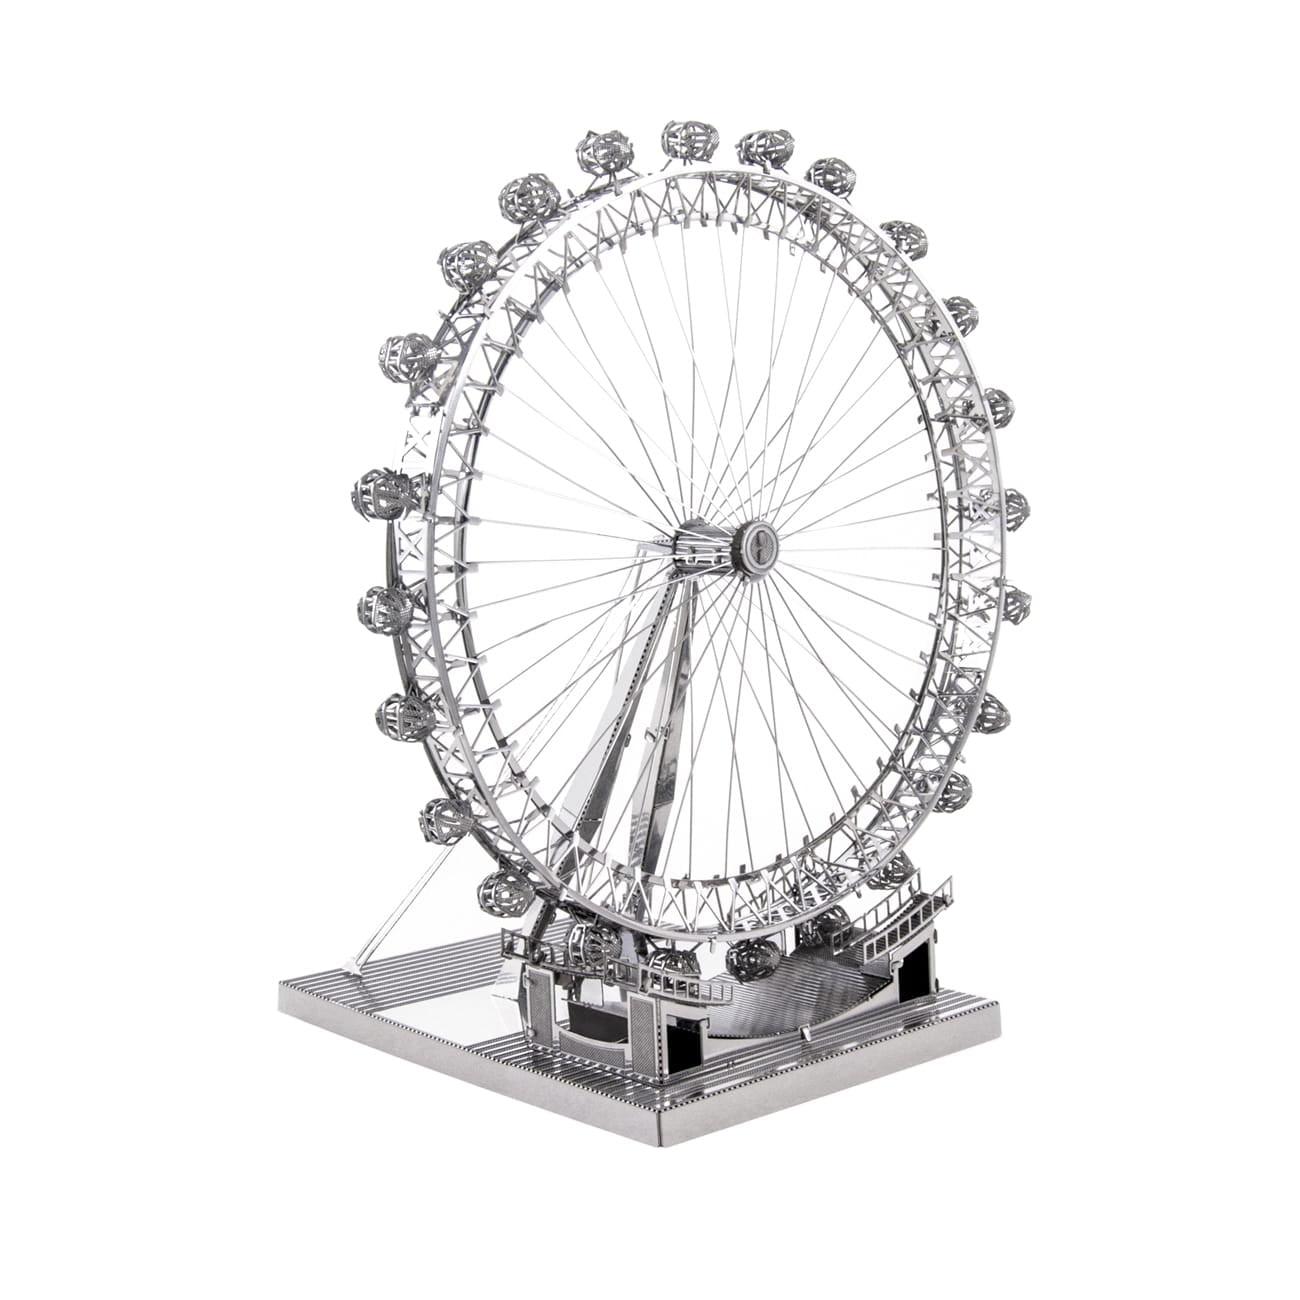 ICONX 3D Metal Model Kit, London Eye by Fascinations